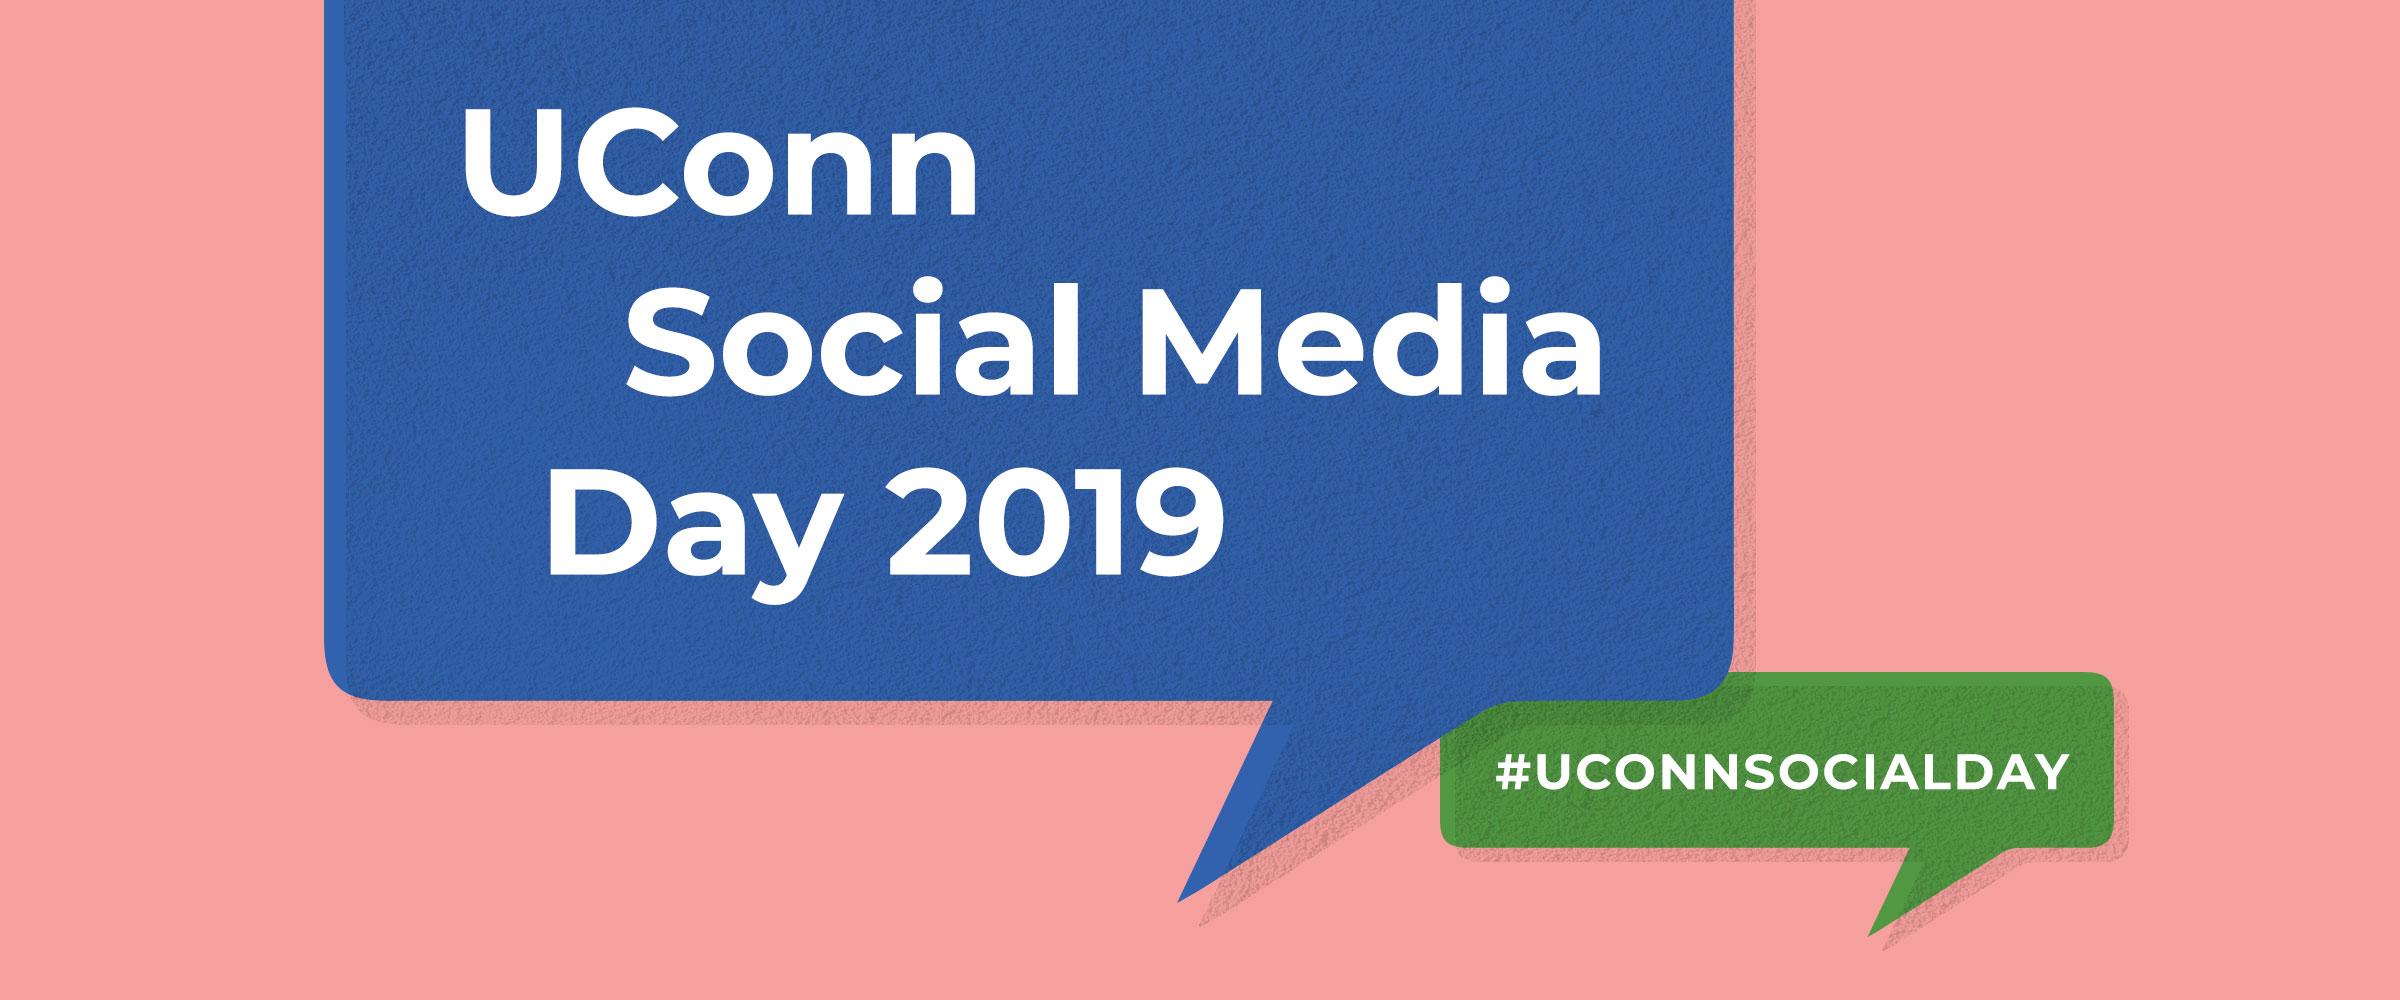 UConn Social Media Day 2019 #uconnsocialday